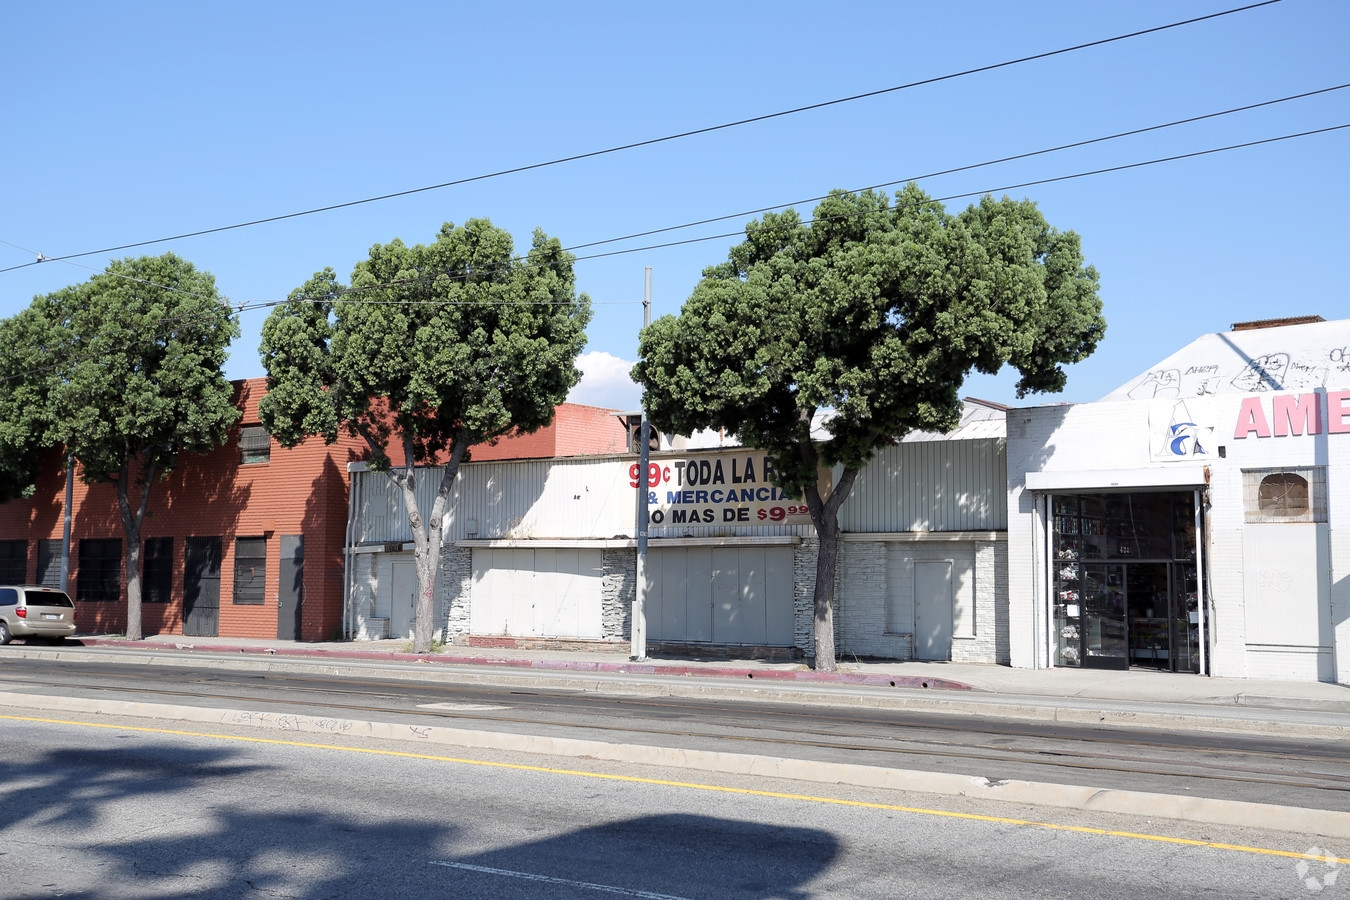 413-415 E Washington Blvd, Los Angeles, CA 90015 (2).jpg